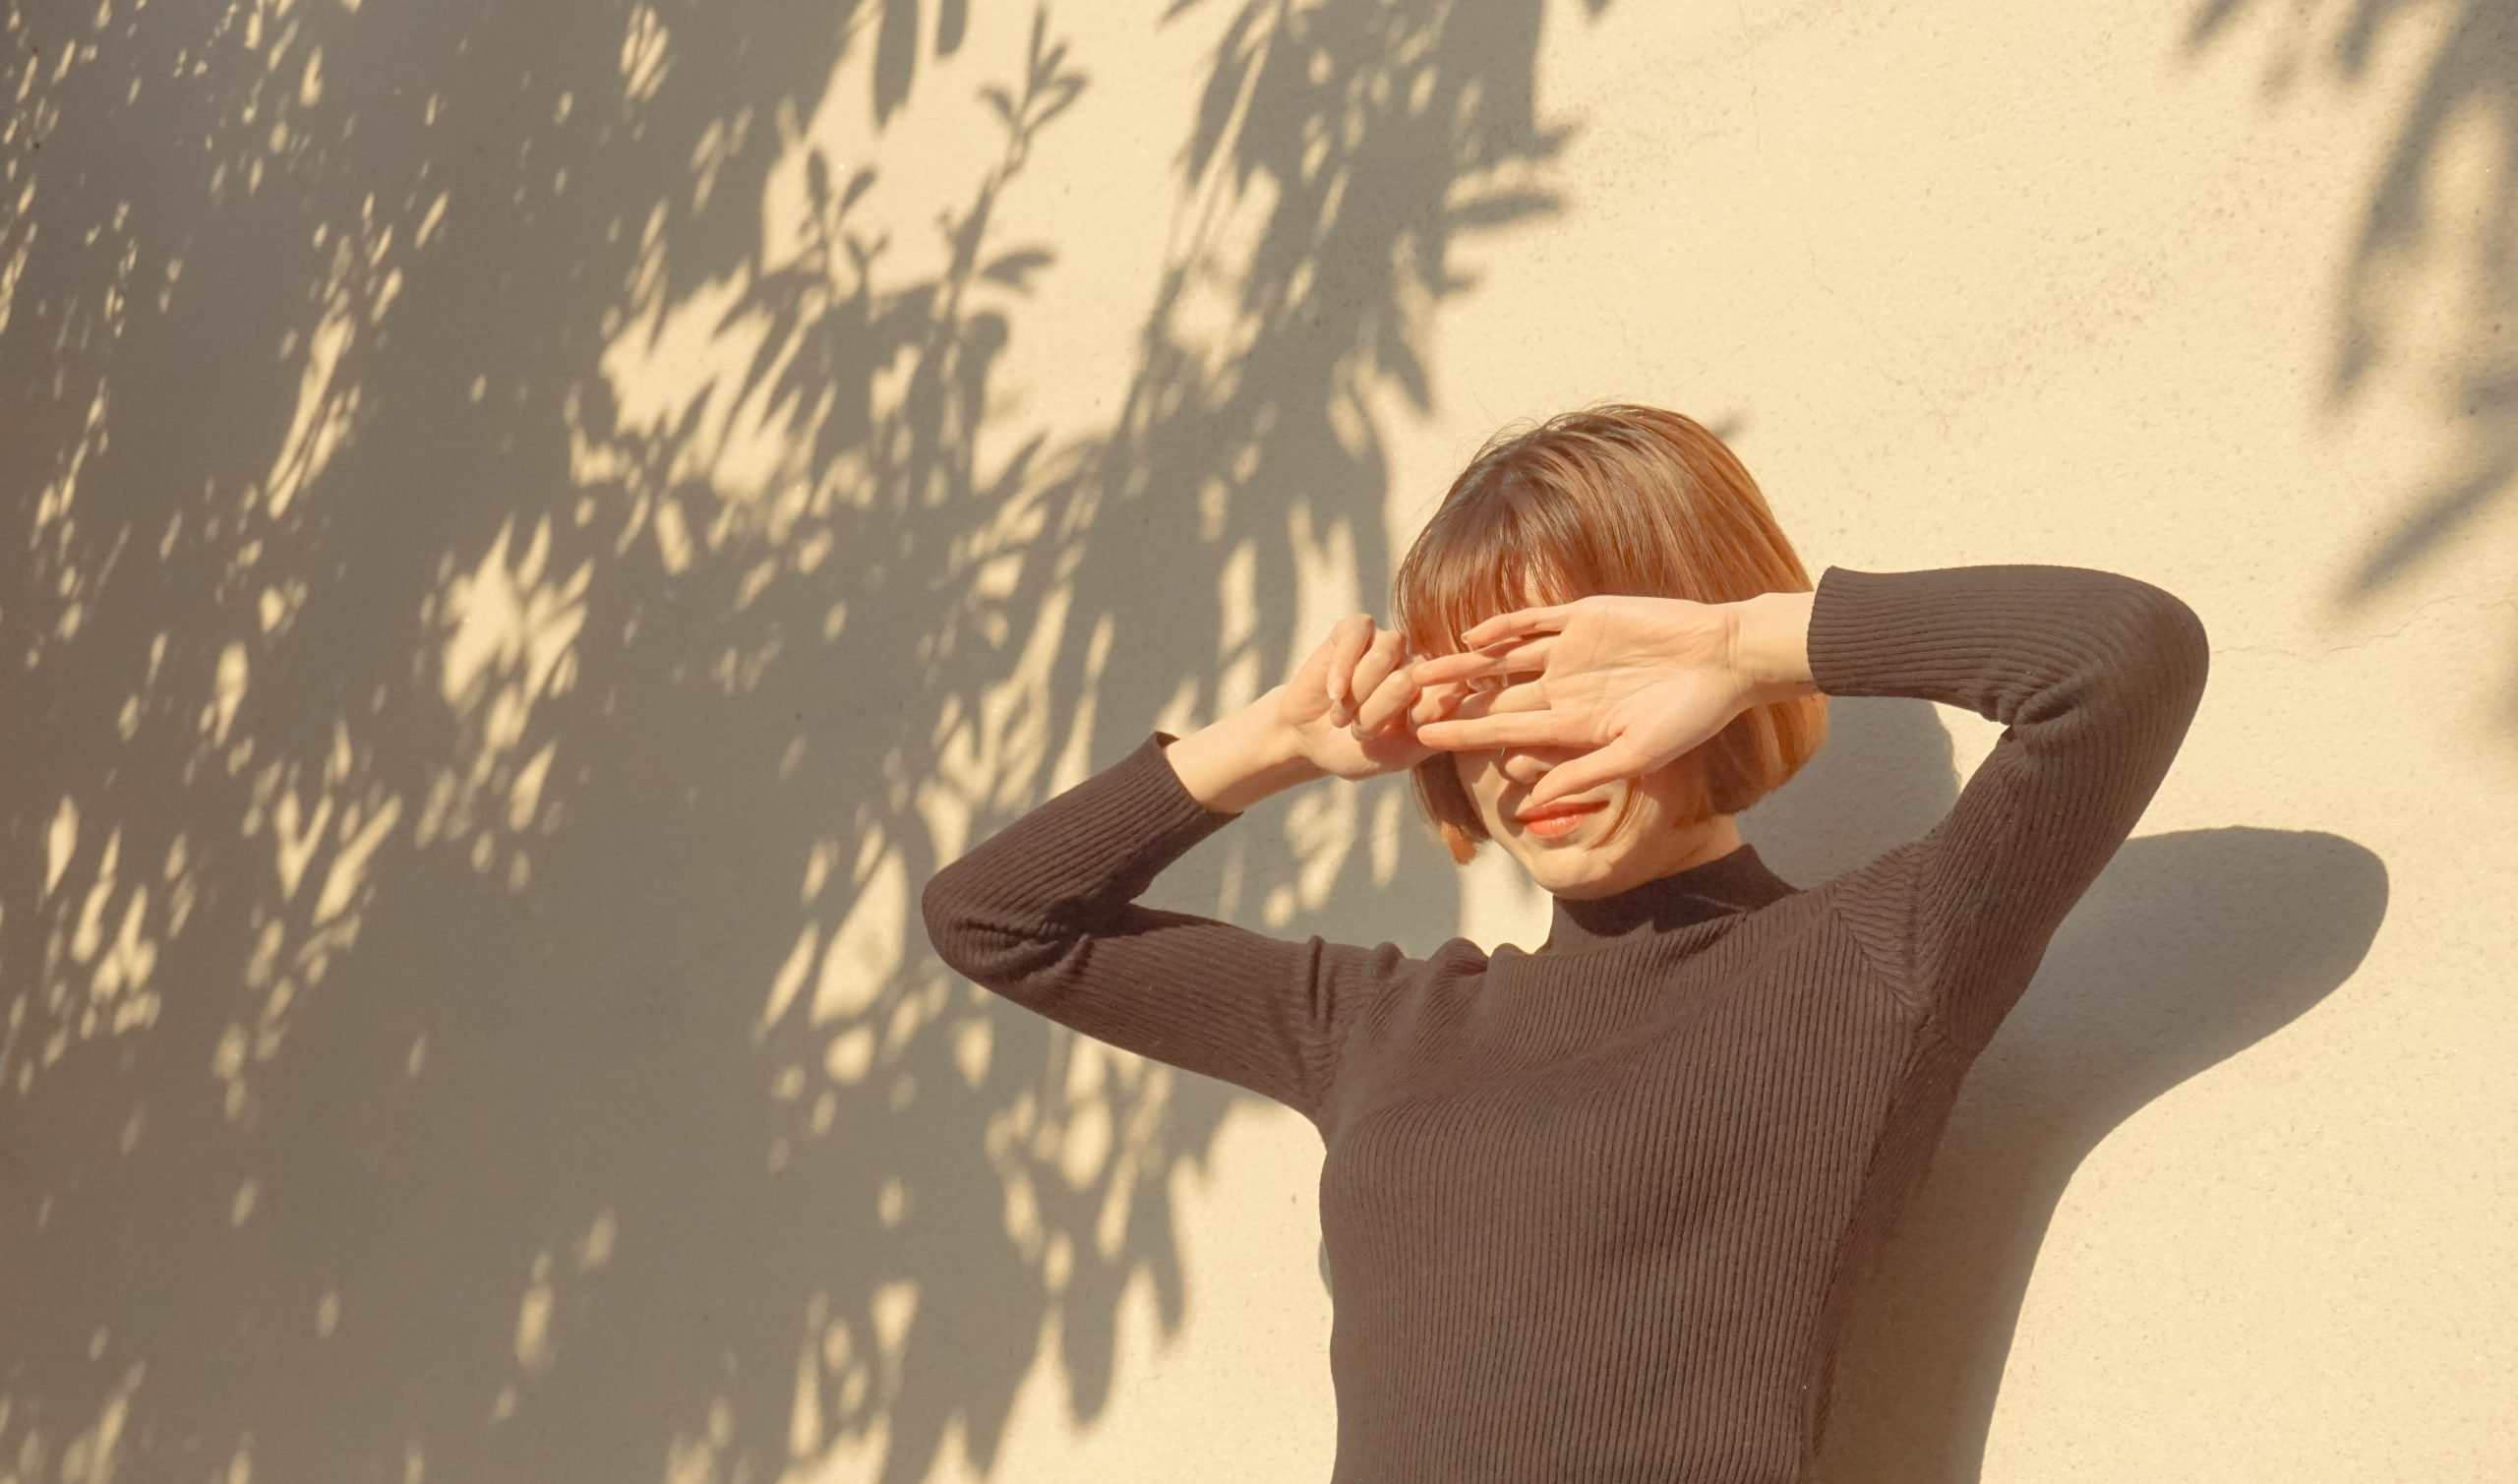 anti aging cream to protect against sun